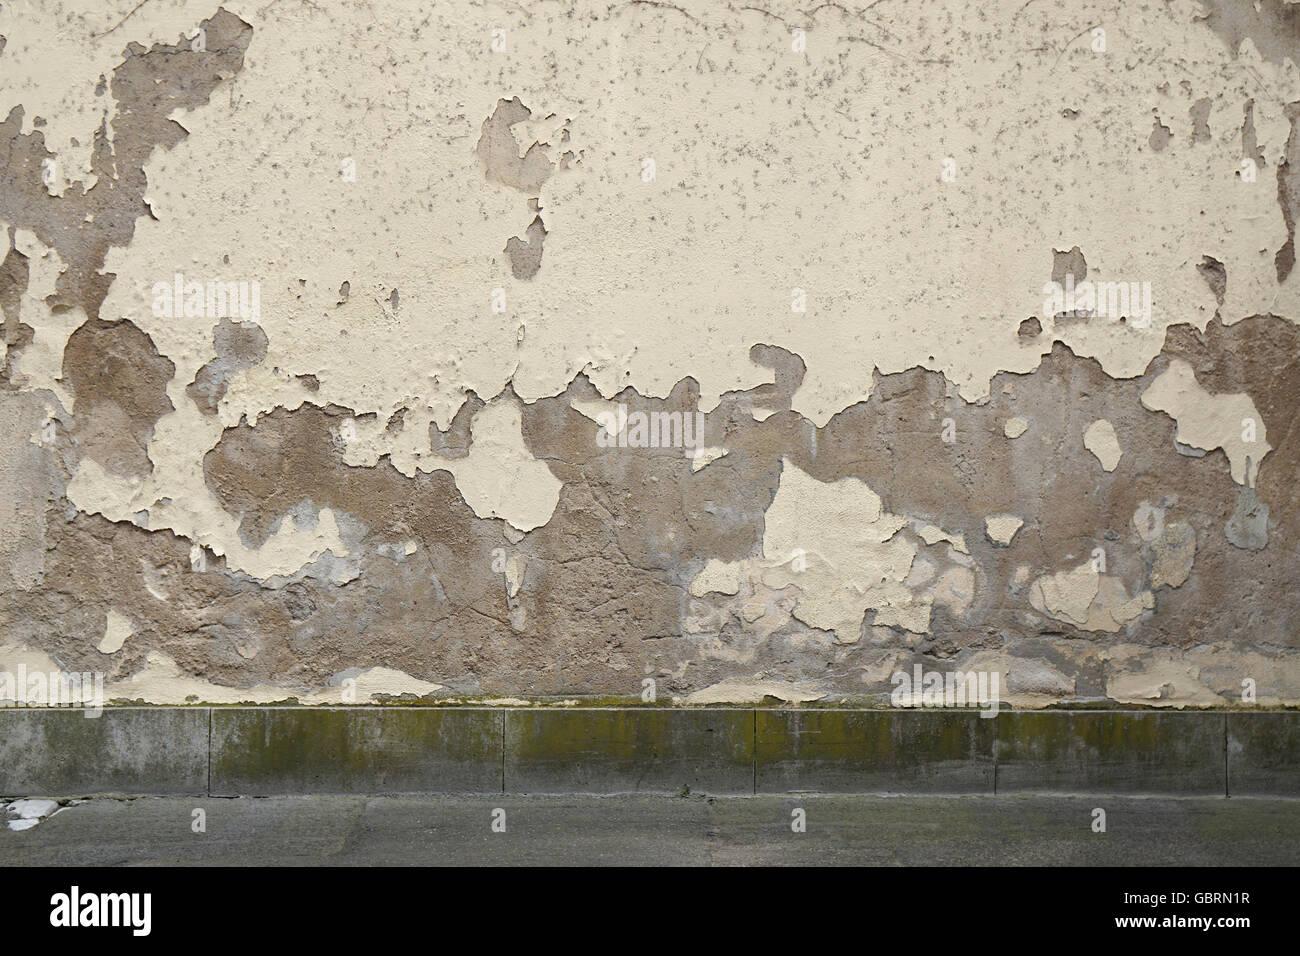 Reparar Pared Exterior Desconchada Awesome Stunning Manchas De  ~ Como Arreglar Una Pared Desconchada